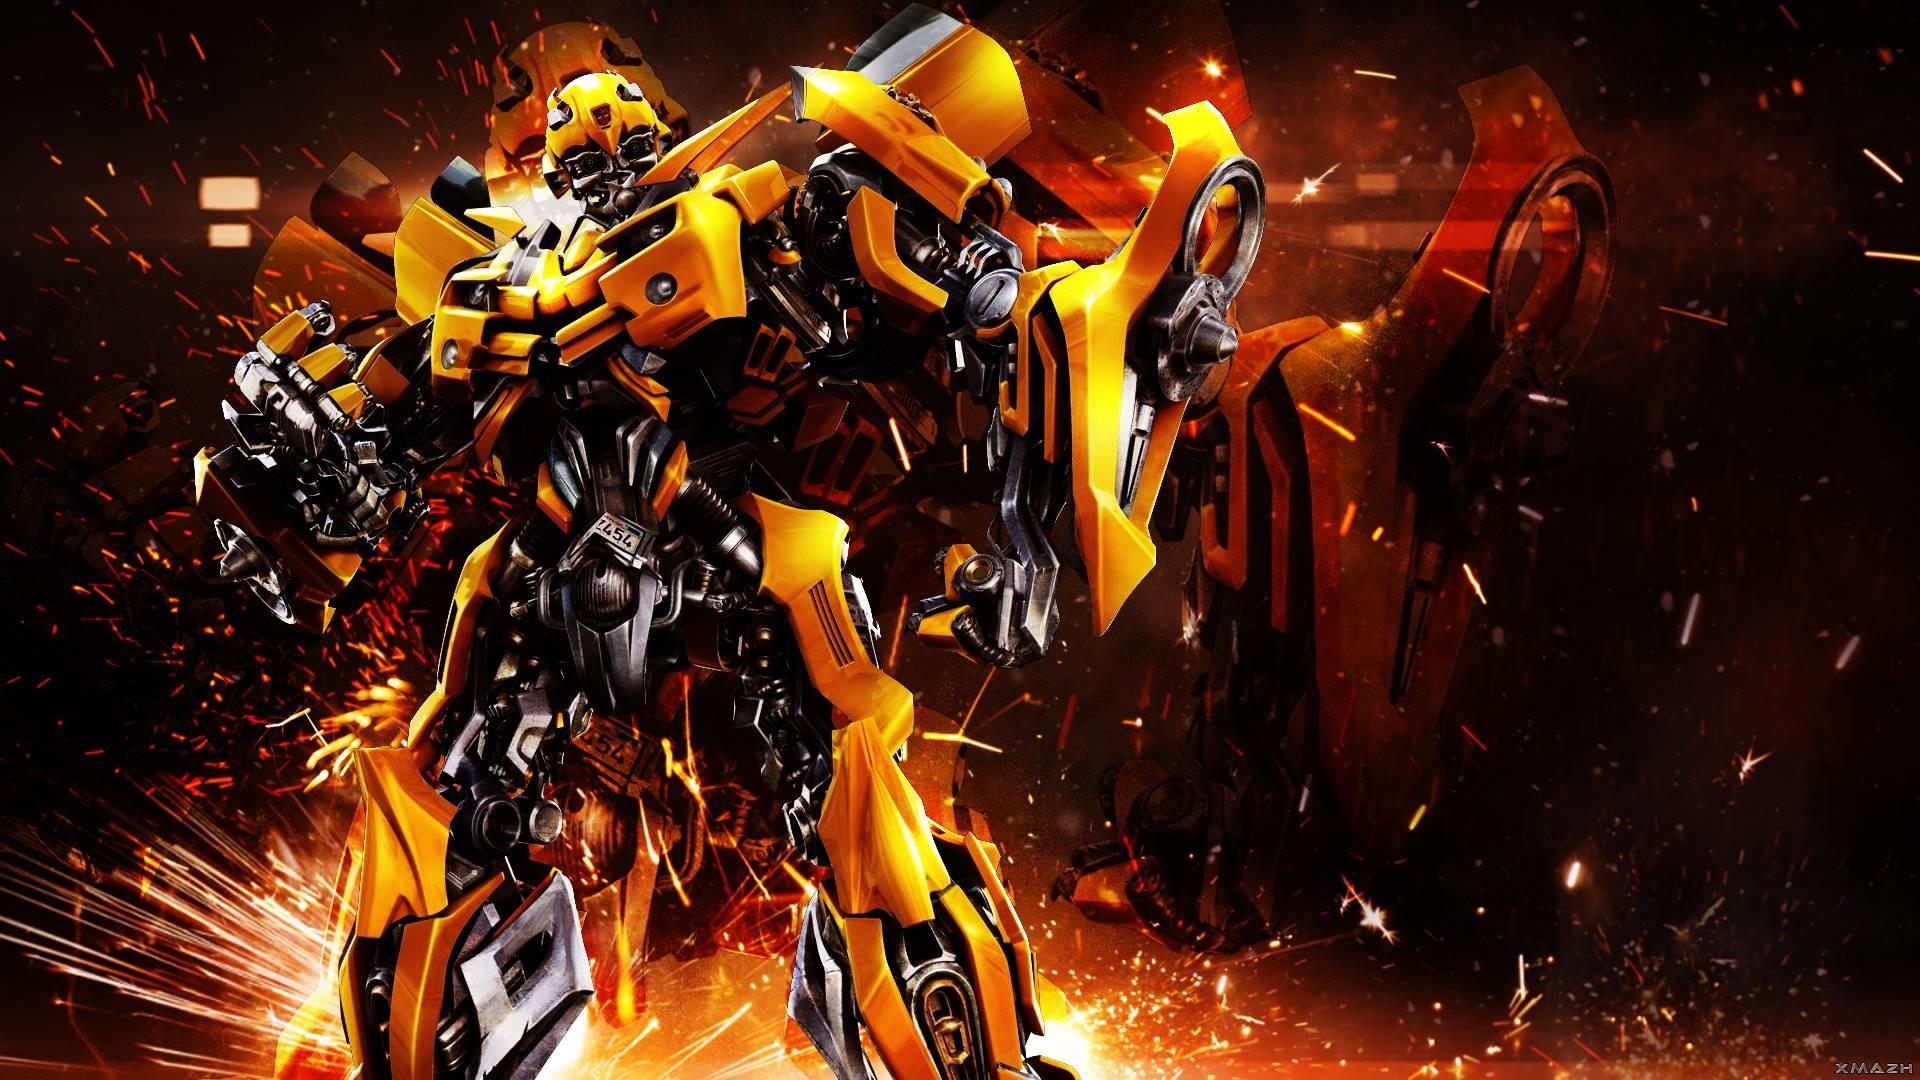 Transformers Wallpaper Bumblebee 65 Images